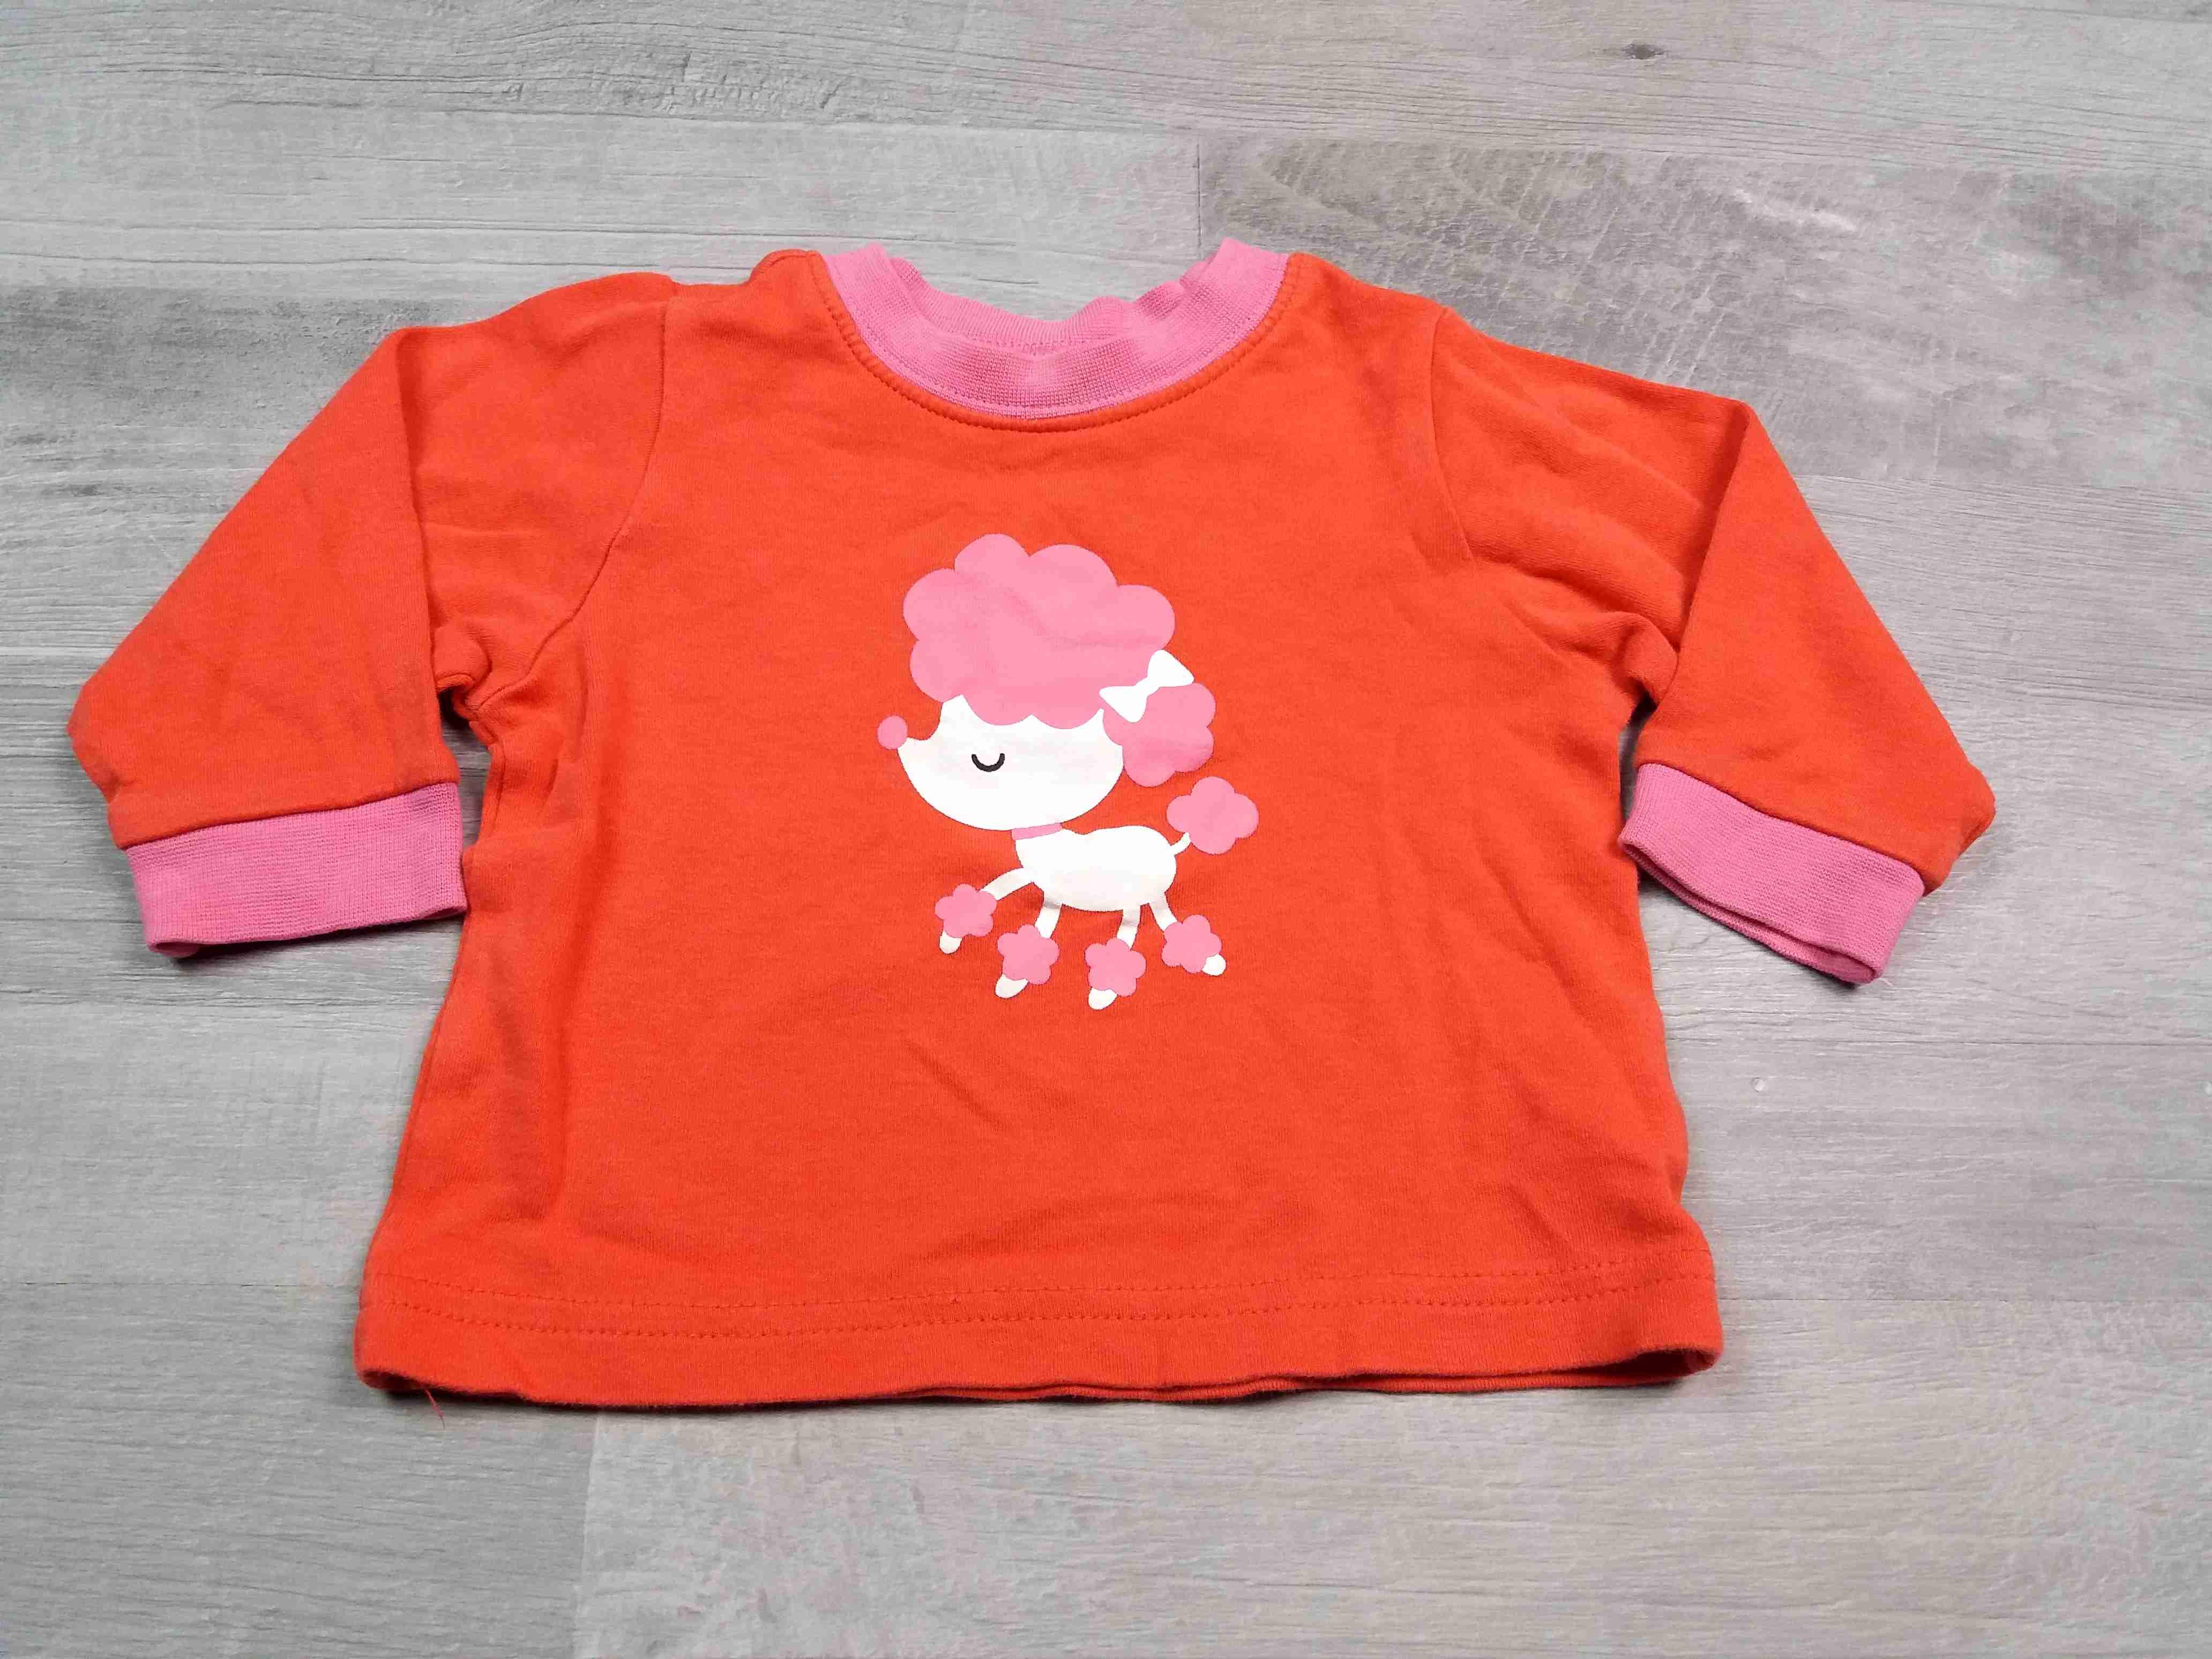 bc52fe795bc tričko dl.rukáv růžové s pejskem vel 68